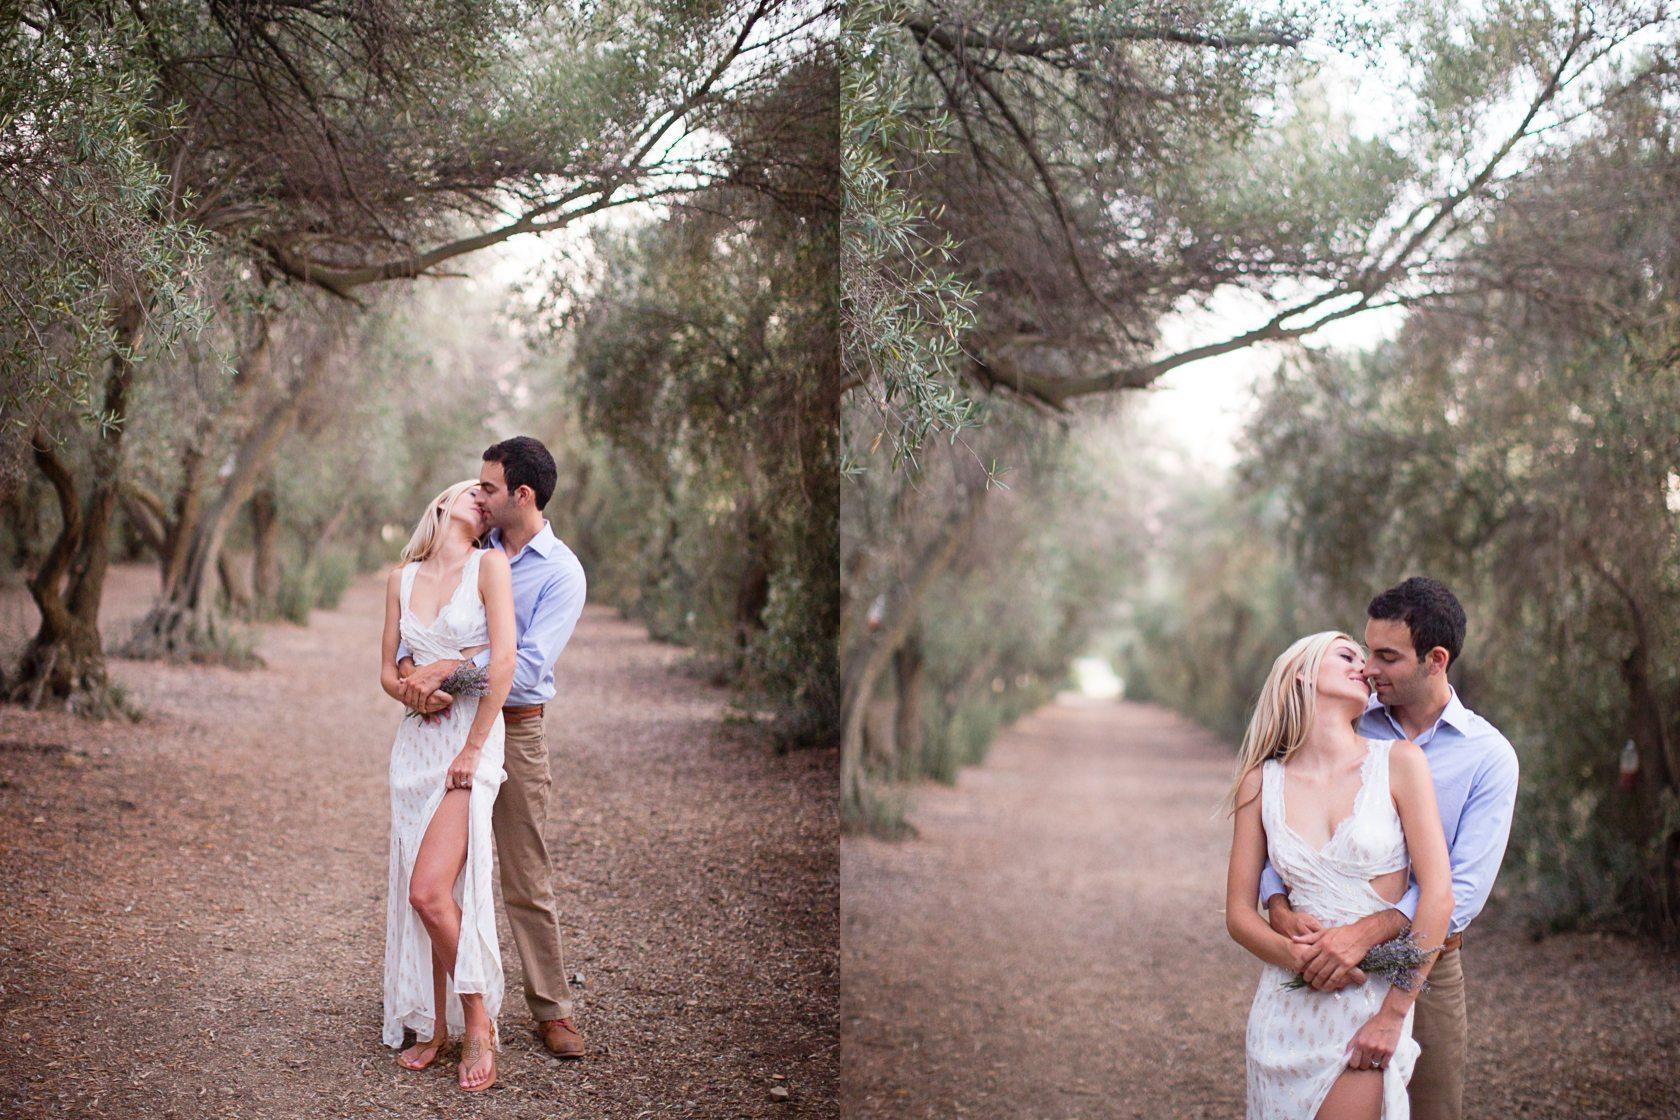 Highland_Springs_Lavender_Field_Engagement_45.jpg